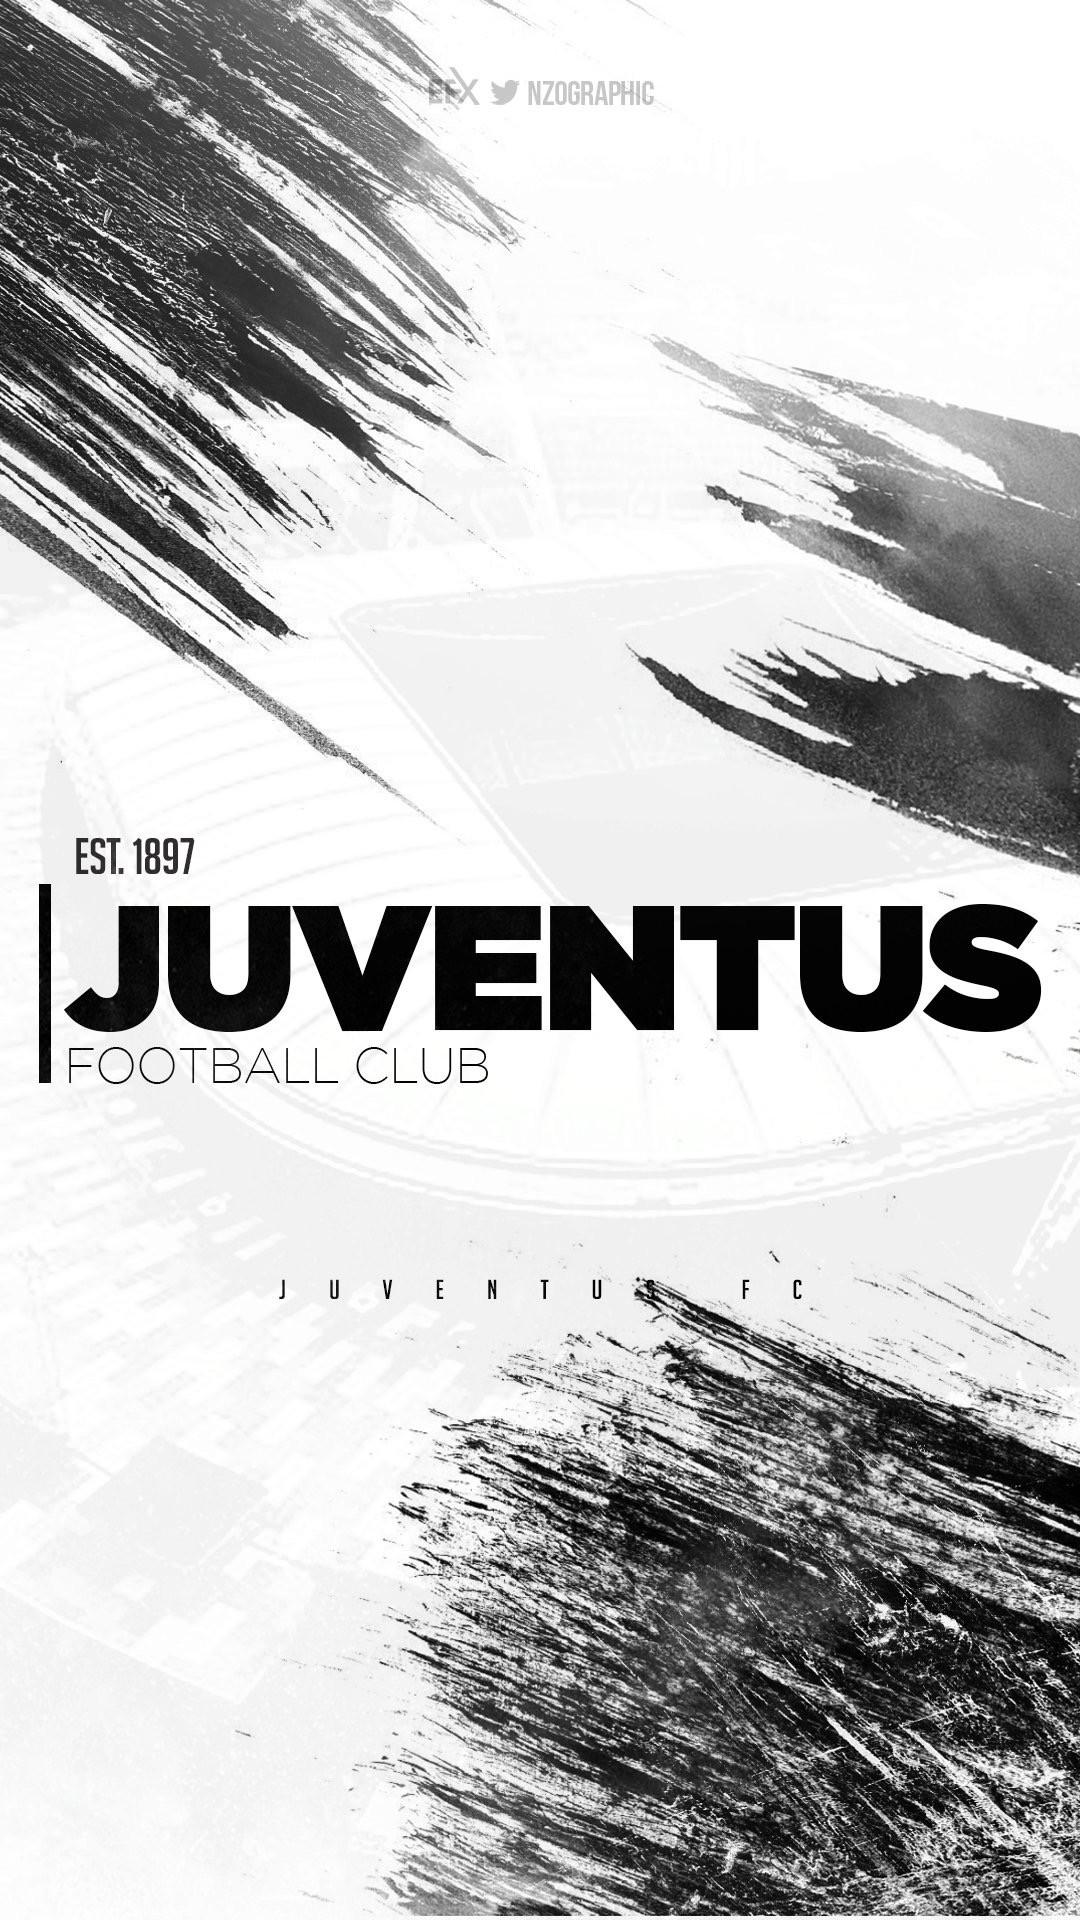 Wallpaper Manchester United Hd Logo Juventus Wallpaper 2018 75 Images